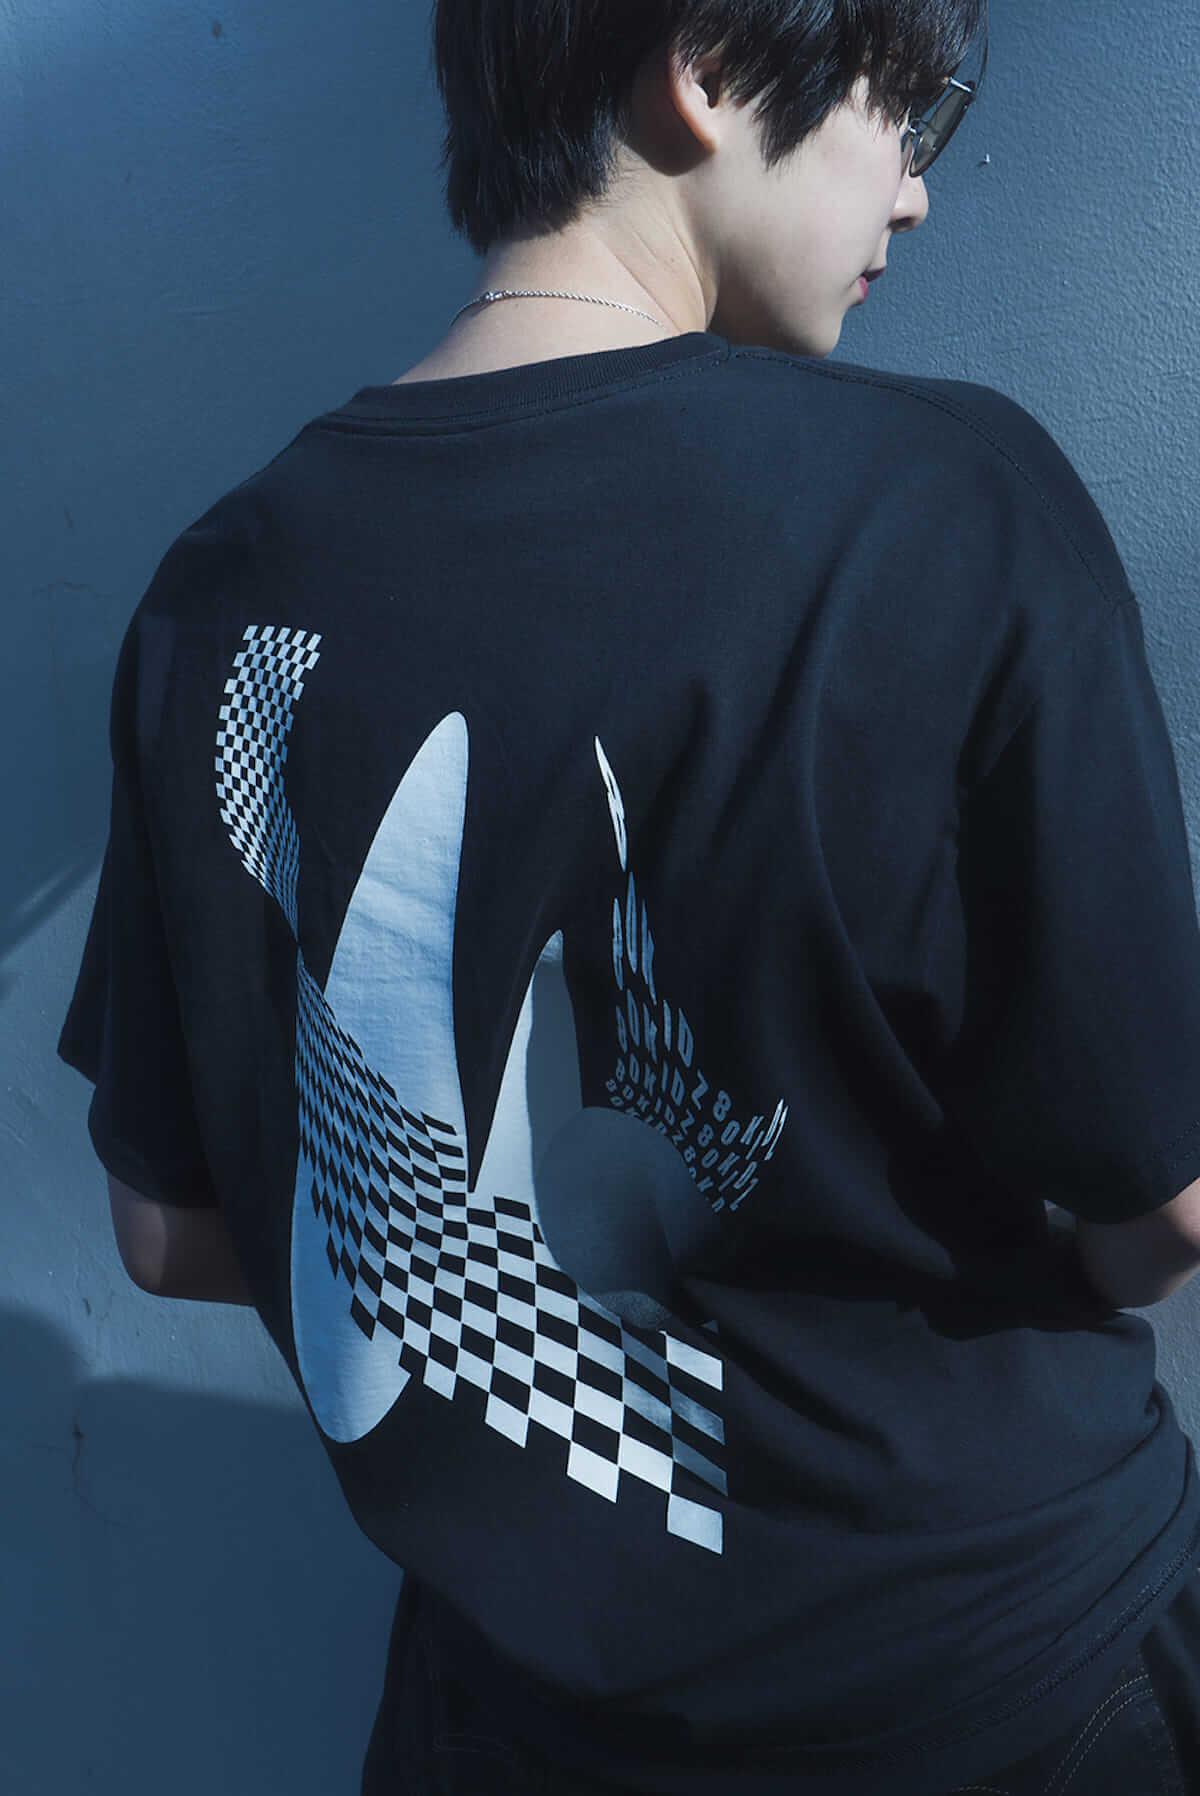 80KIDZのデビュー10周年WEB SHOPがオープン ベスト盤やリミックス集、YOSHIROTTENとのコラボTシャツのプレオーダー開始 music180804-80kidz10thanniv-5-1200x1796